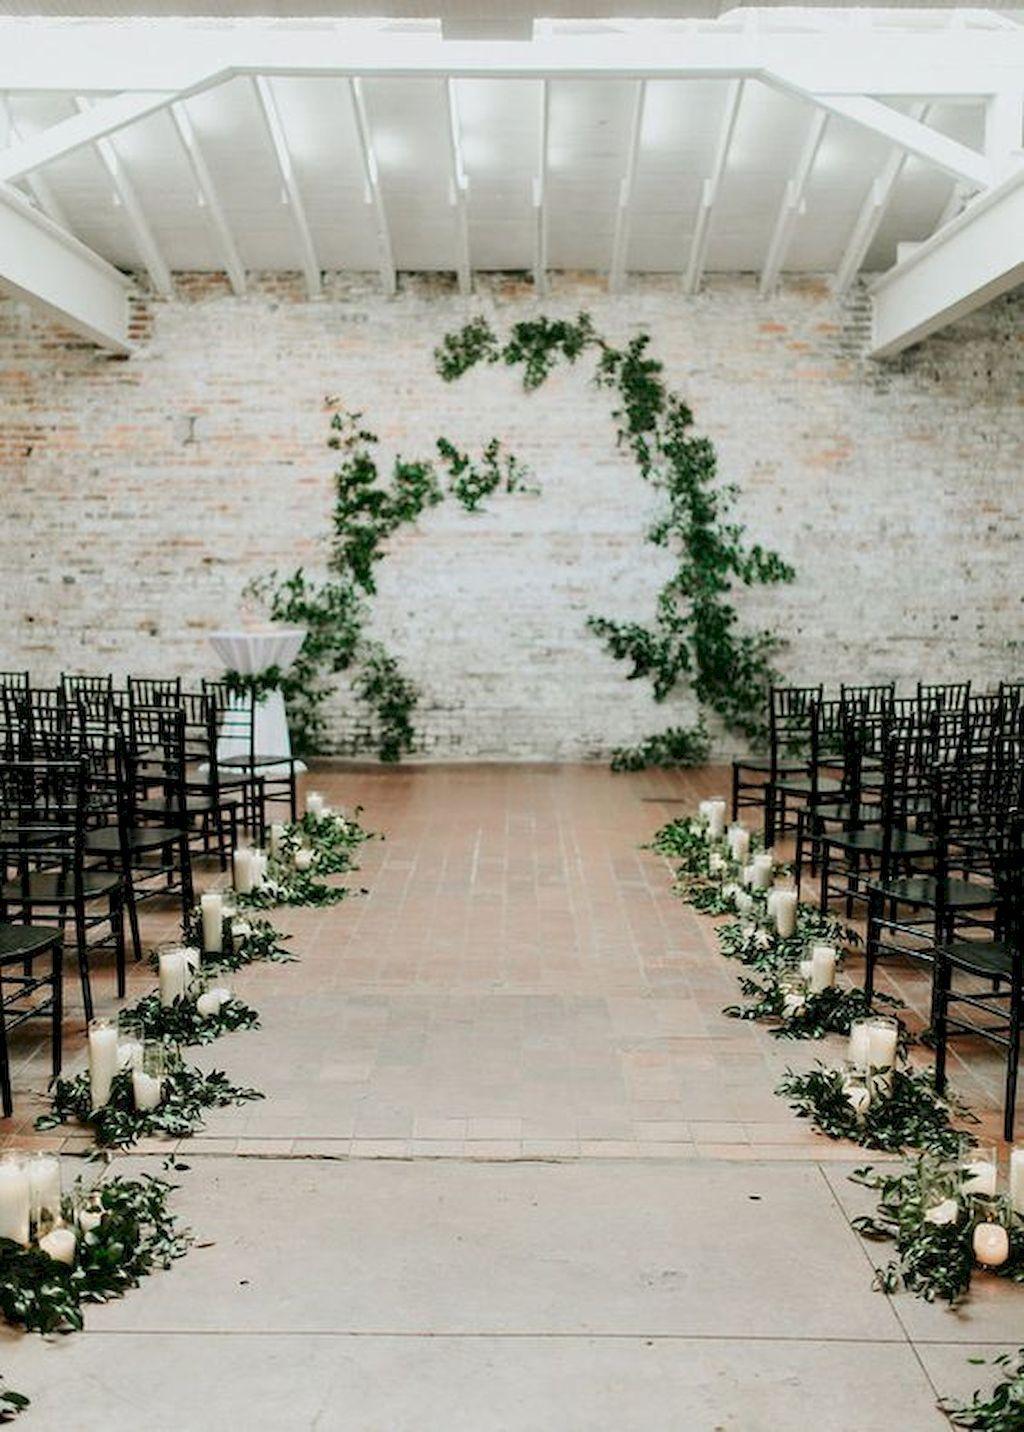 Wedding decor ideas simple   Simple Greenery Wedding Centerpieces Decor Ideas  Wedding in